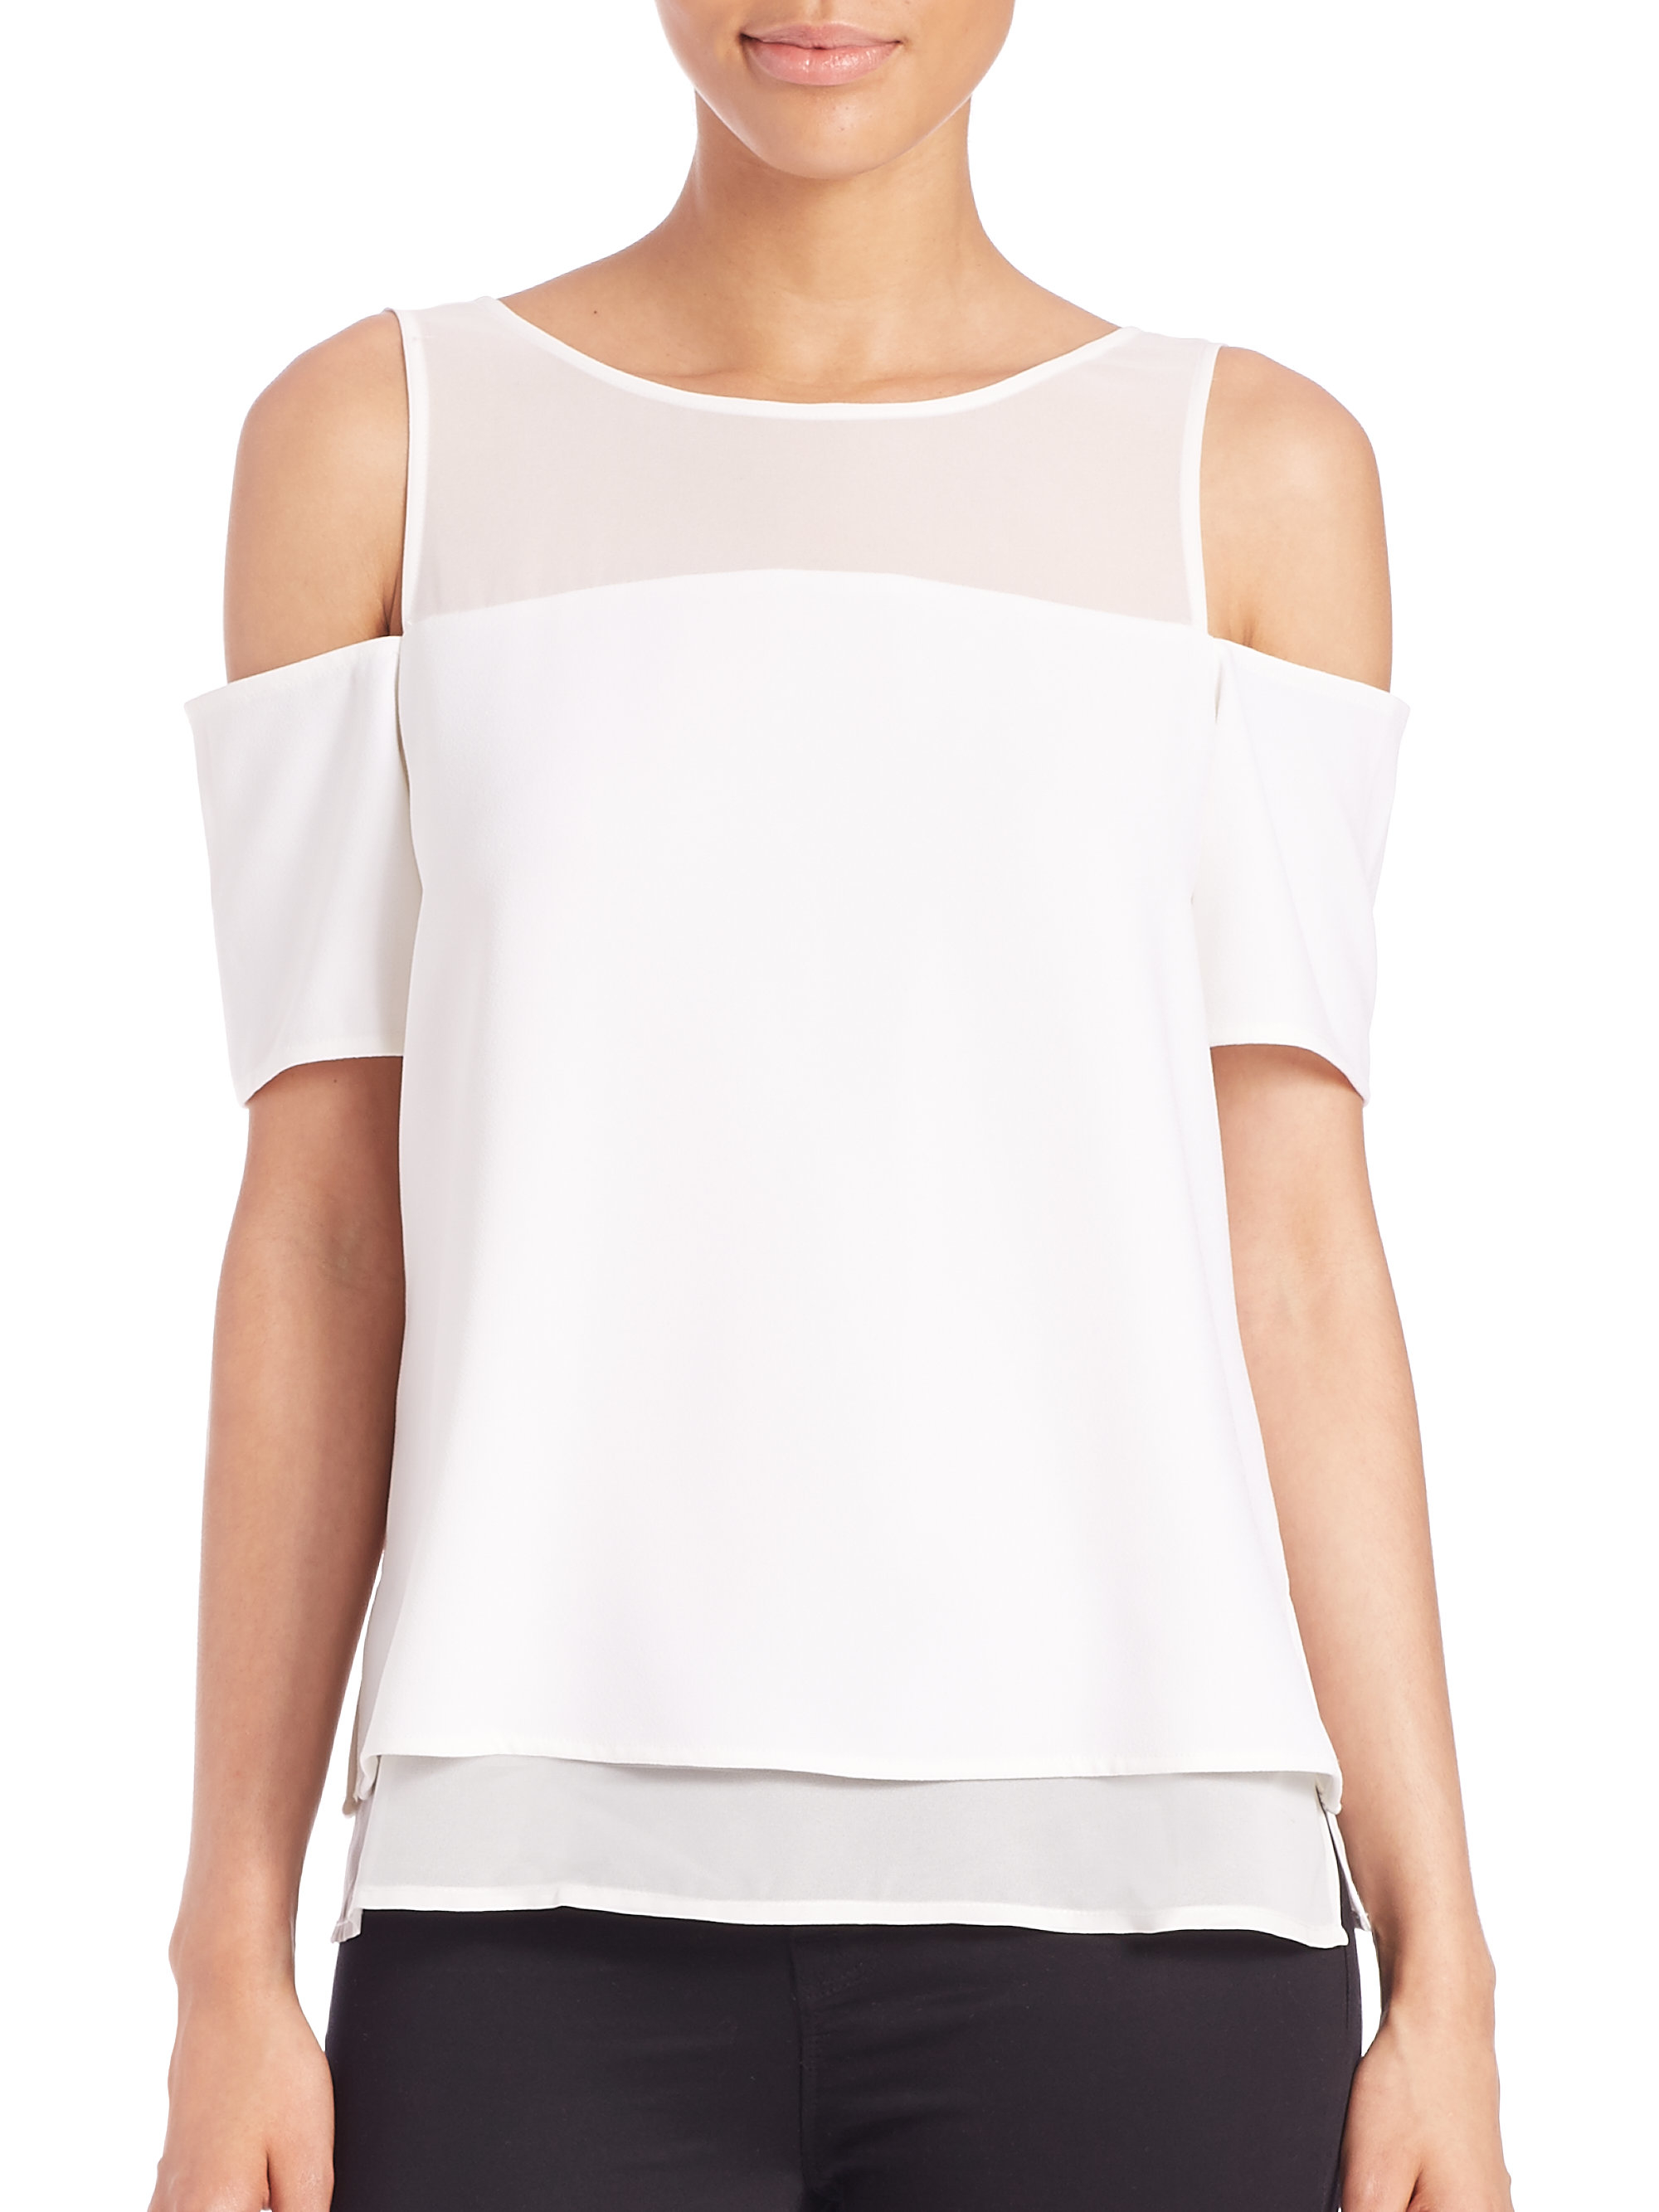 Cooper amp ella lily cold shoulder sheer yoke top in white lyst